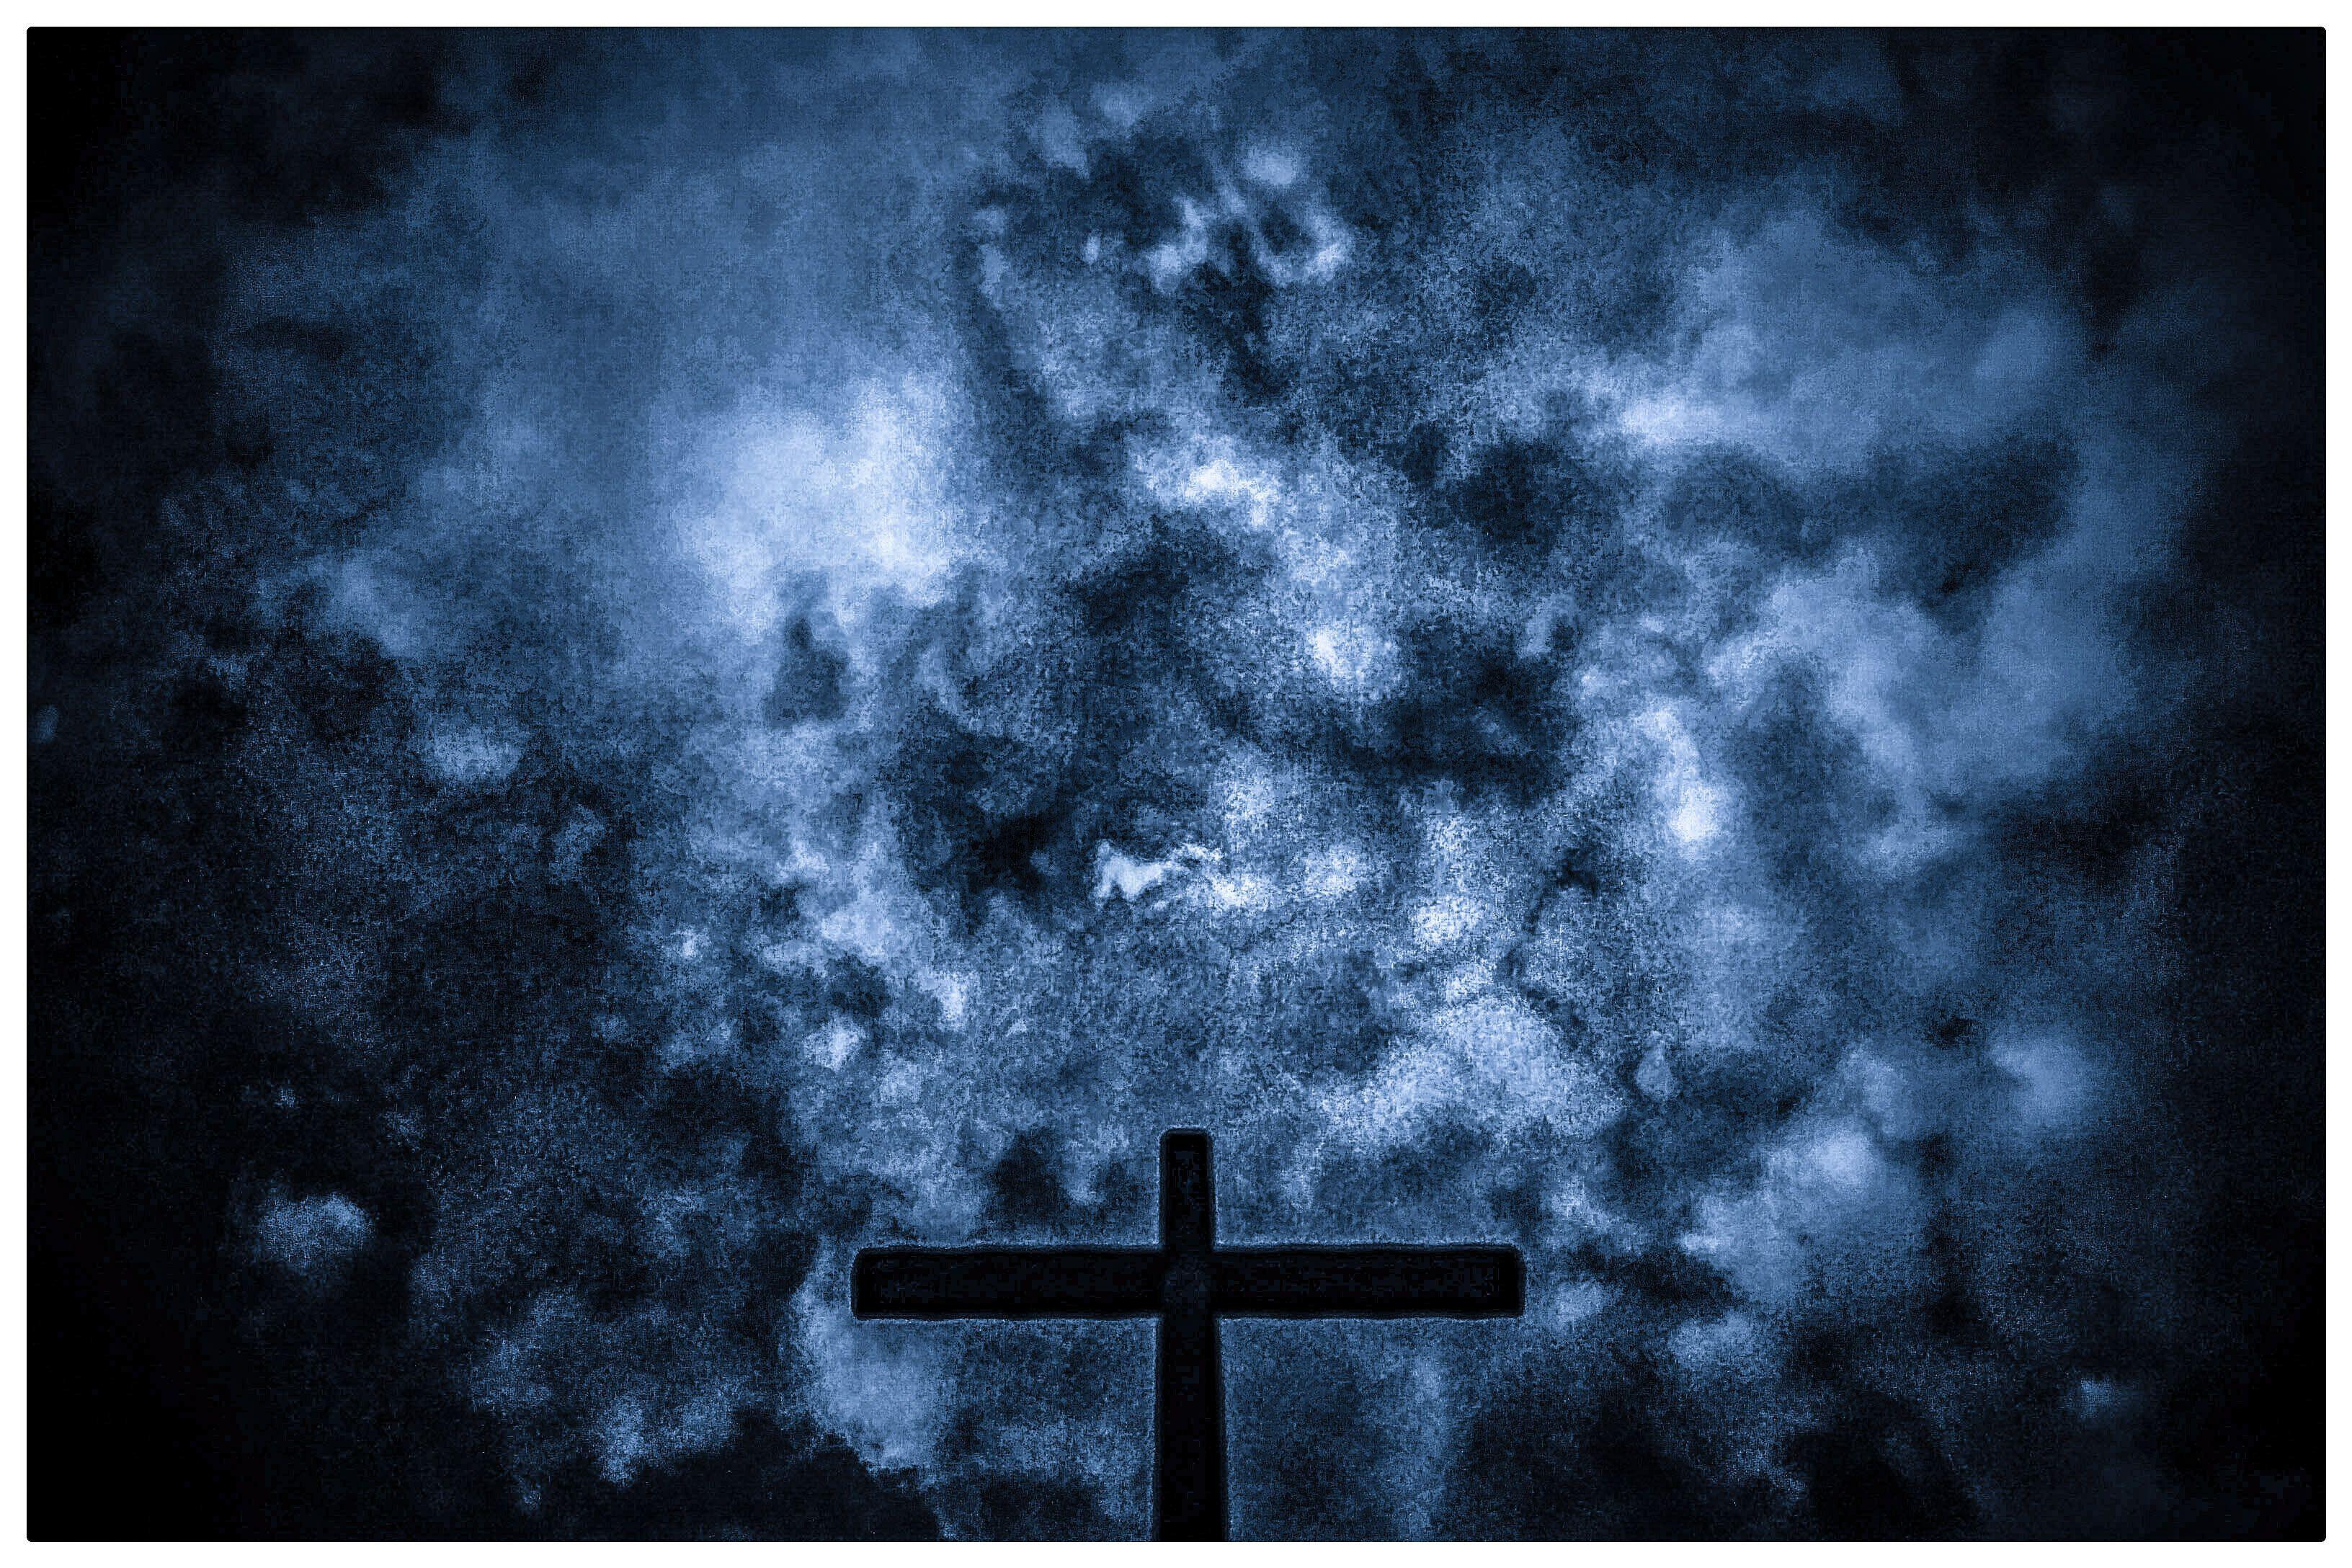 ... faith on troubled skies